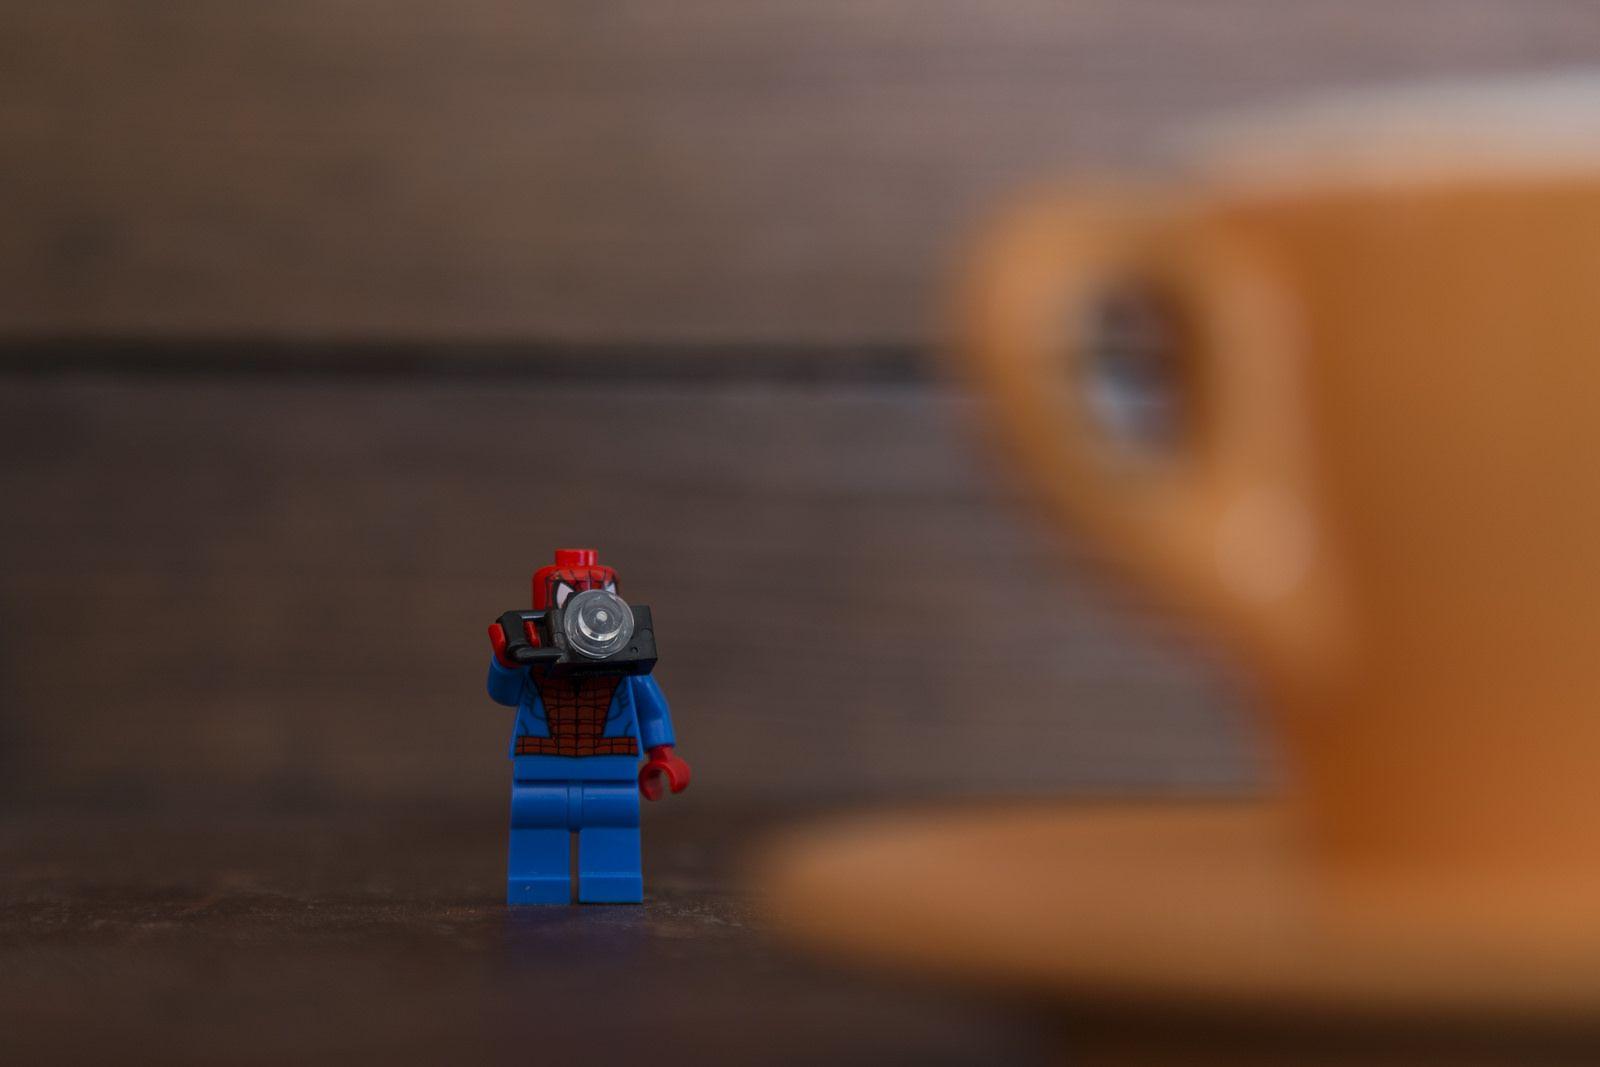 Spider Lego hipster tomando fotos al café | Flickr - Photo Sharing!